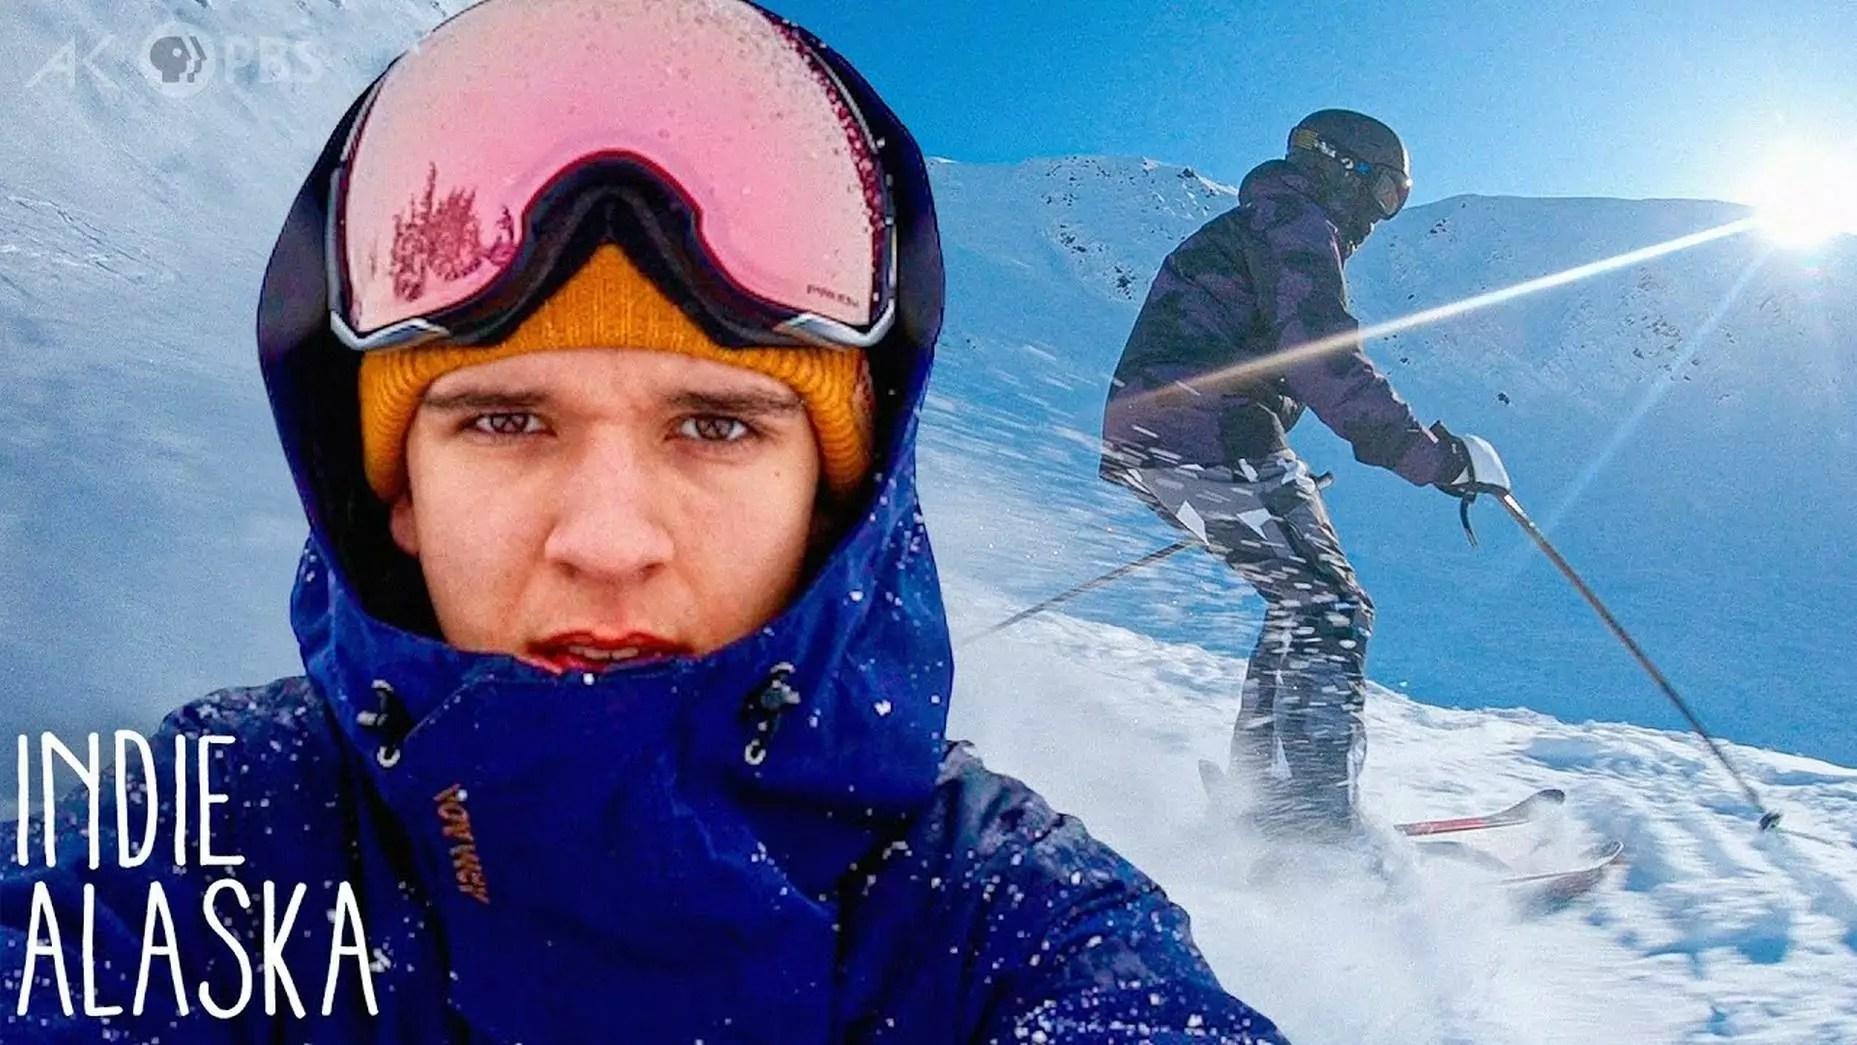 Skiing Alaska's extreme slopes with videographer Luka Bees.